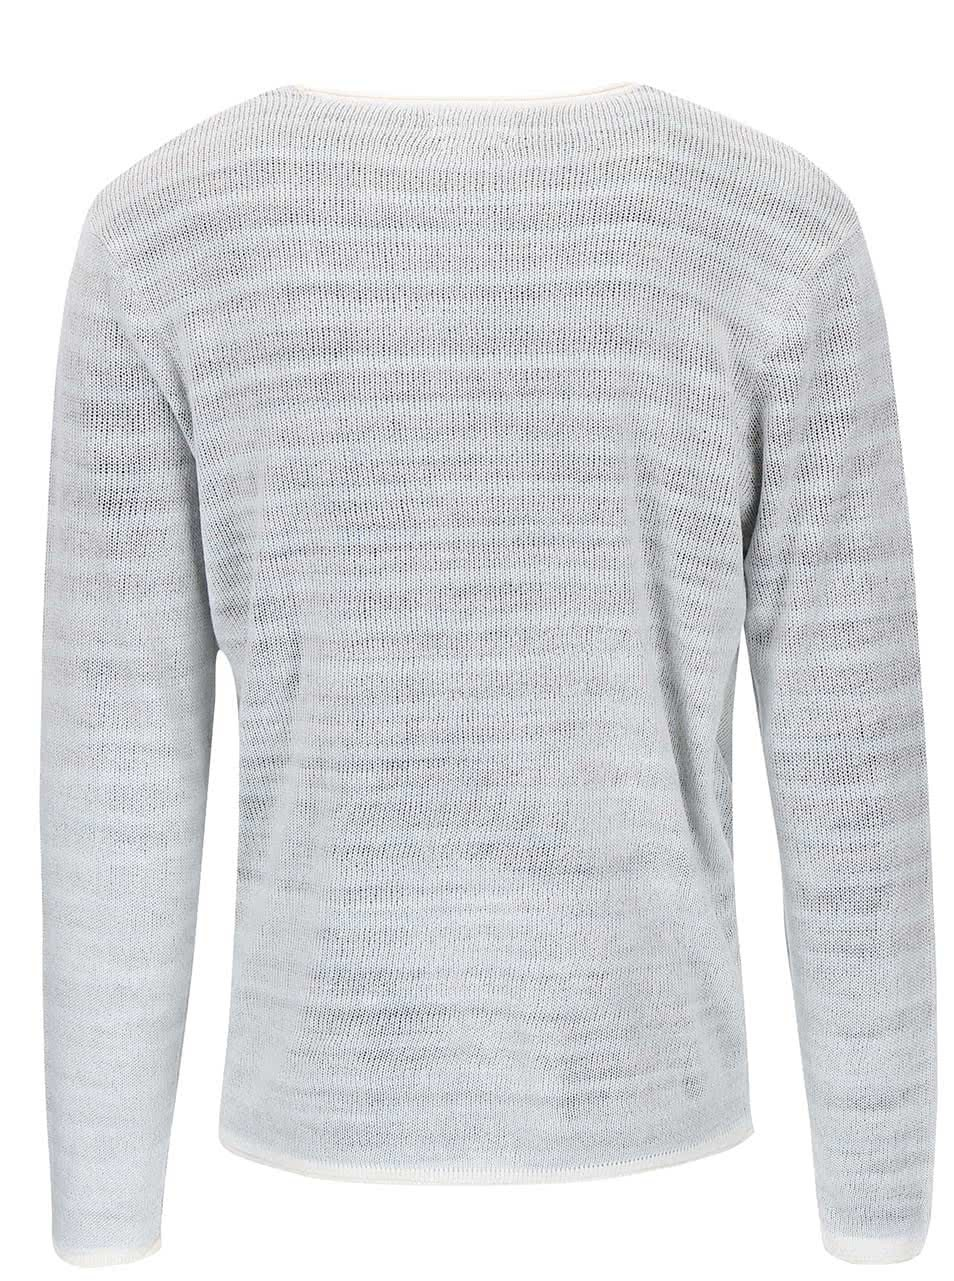 0cf4ed08b5b3 Krémový pruhovaný sveter Jack   Jones Kingston ...